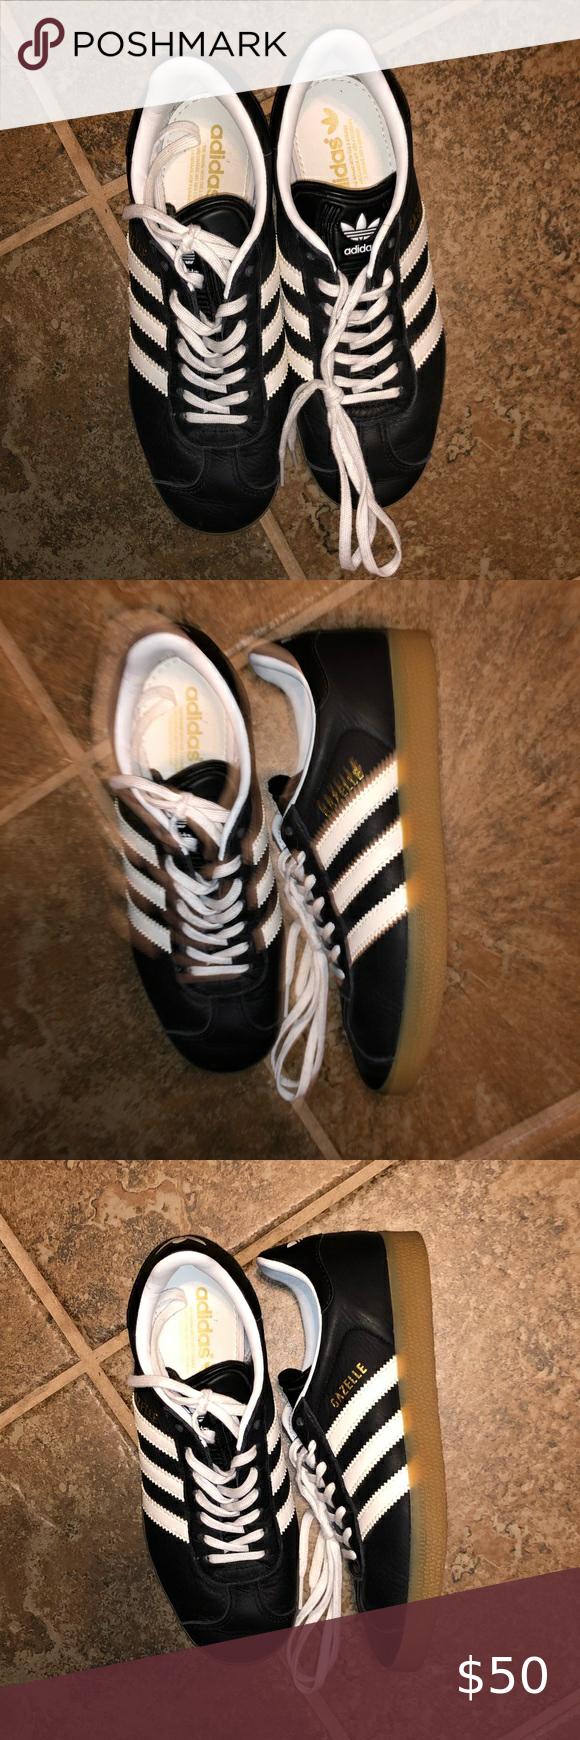 Adidas Gazelle Black Leather Ladies